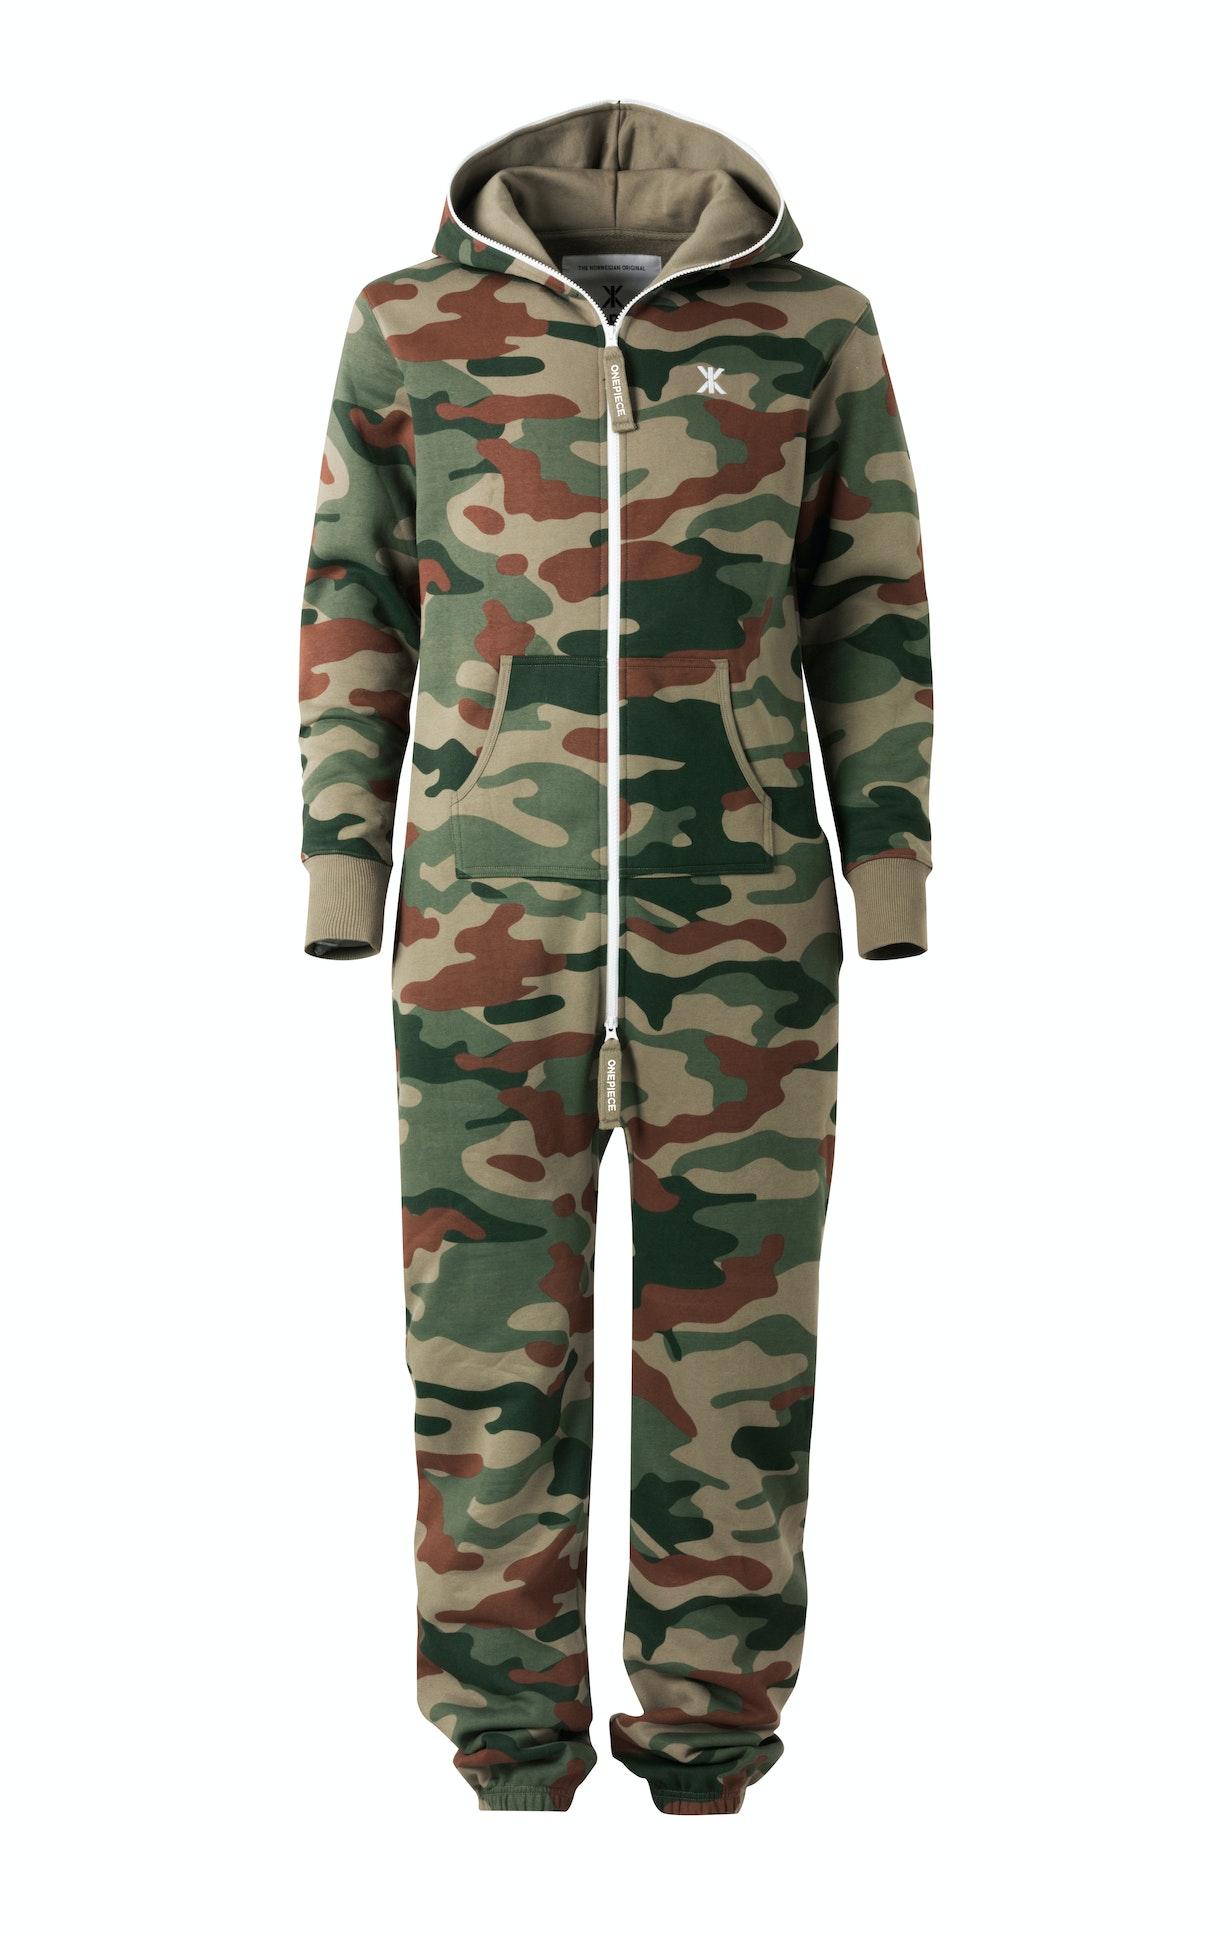 camouflage onesie combinaison jumpsuit onepiece fr. Black Bedroom Furniture Sets. Home Design Ideas